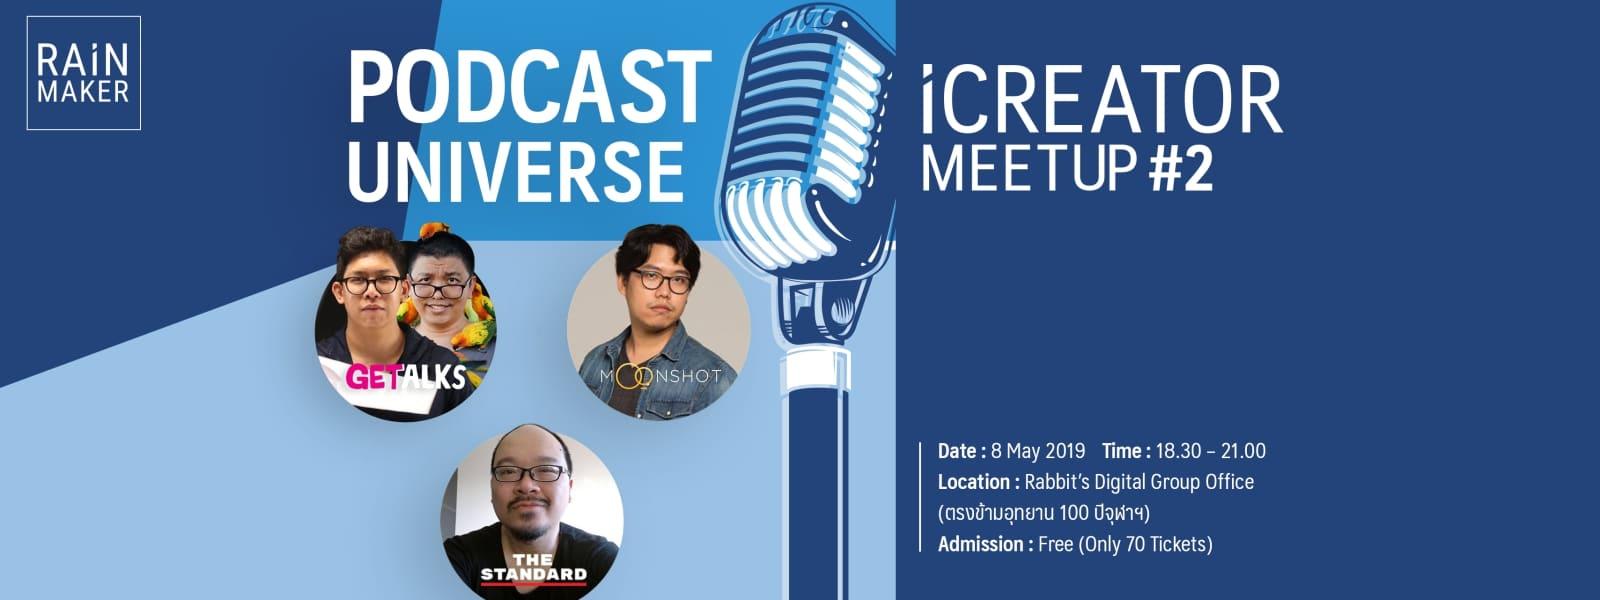 iCreator Meetup #2 ตอน Podcast Universe พาคุณเข้าสู่จักรวาลแห่งการเล่าเรื่องด้วยเสียง